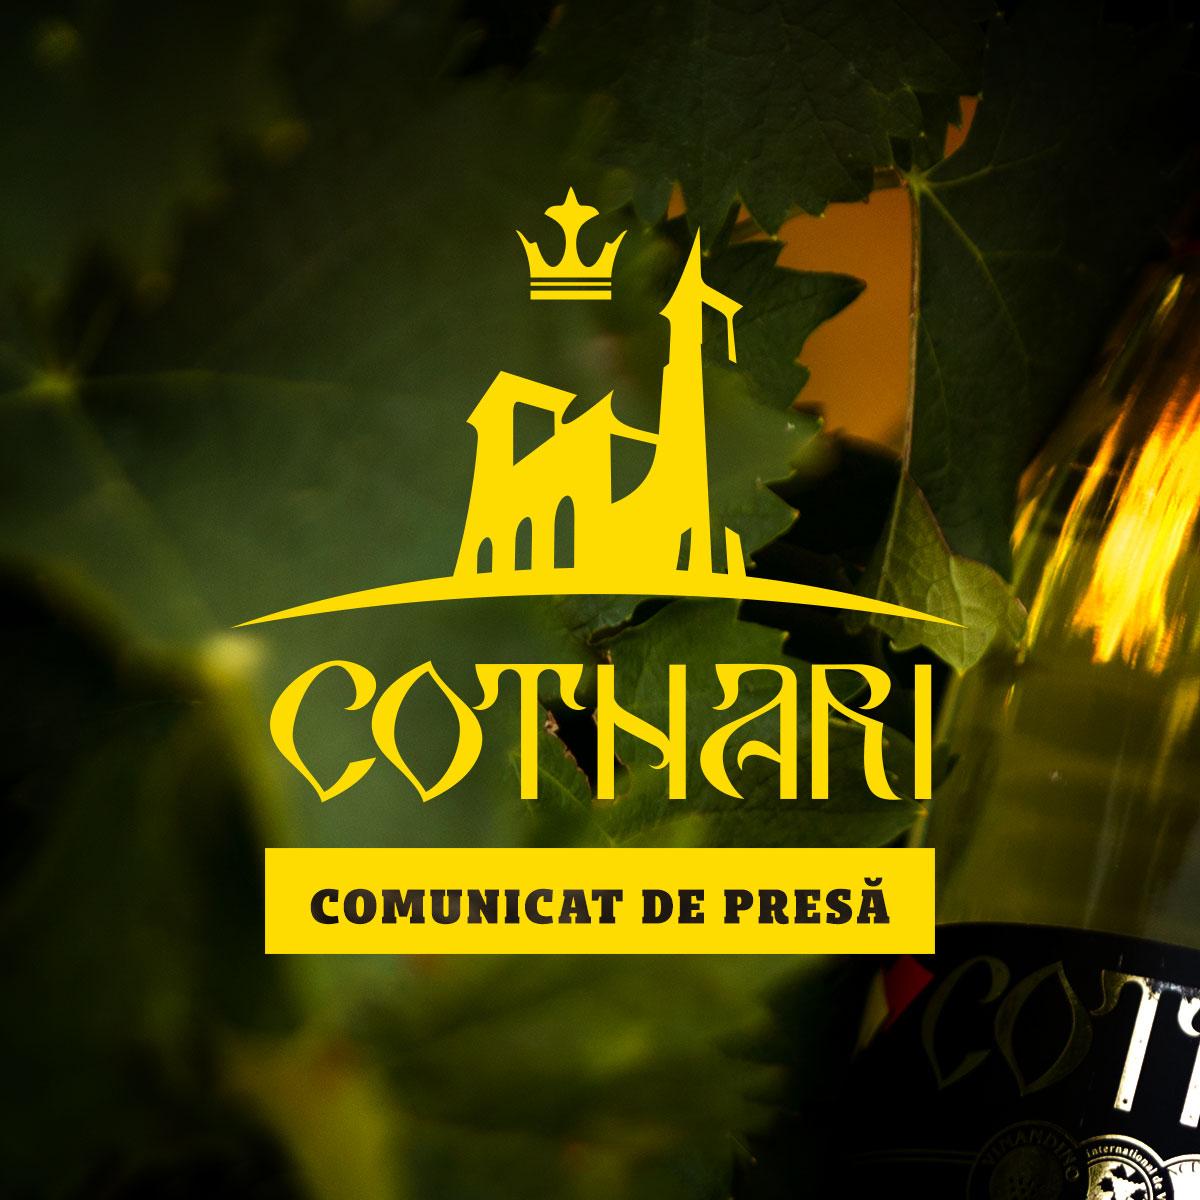 https://www.cotnari.ro/continut/uploads/2017/08/comunicat13.jpg